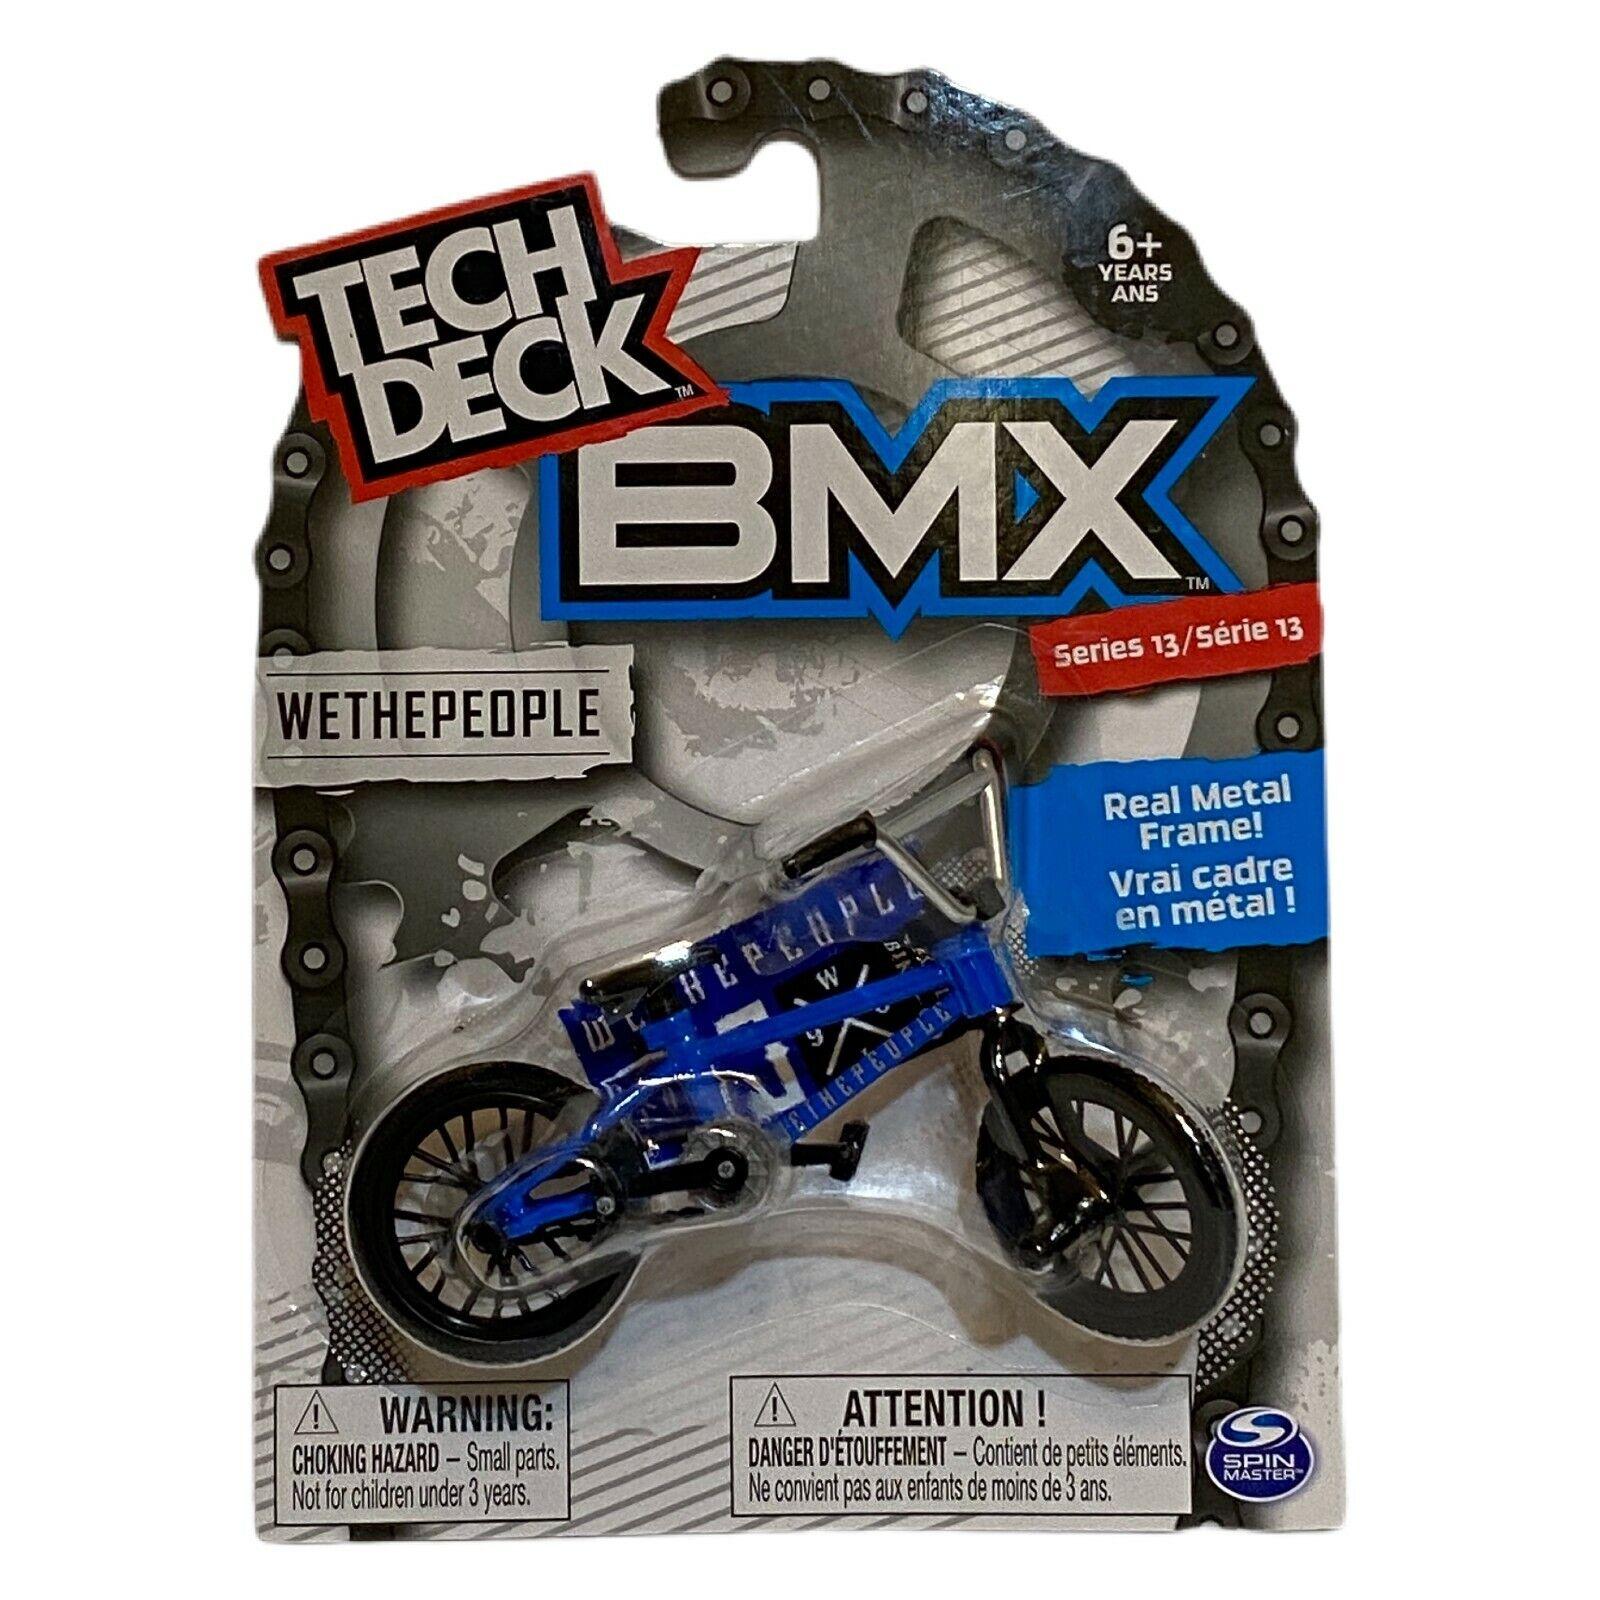 Tech Deck Wethepeople Bmx Dirt Finger Bike Neon Green Toy Series 2 For Sale Online Ebay